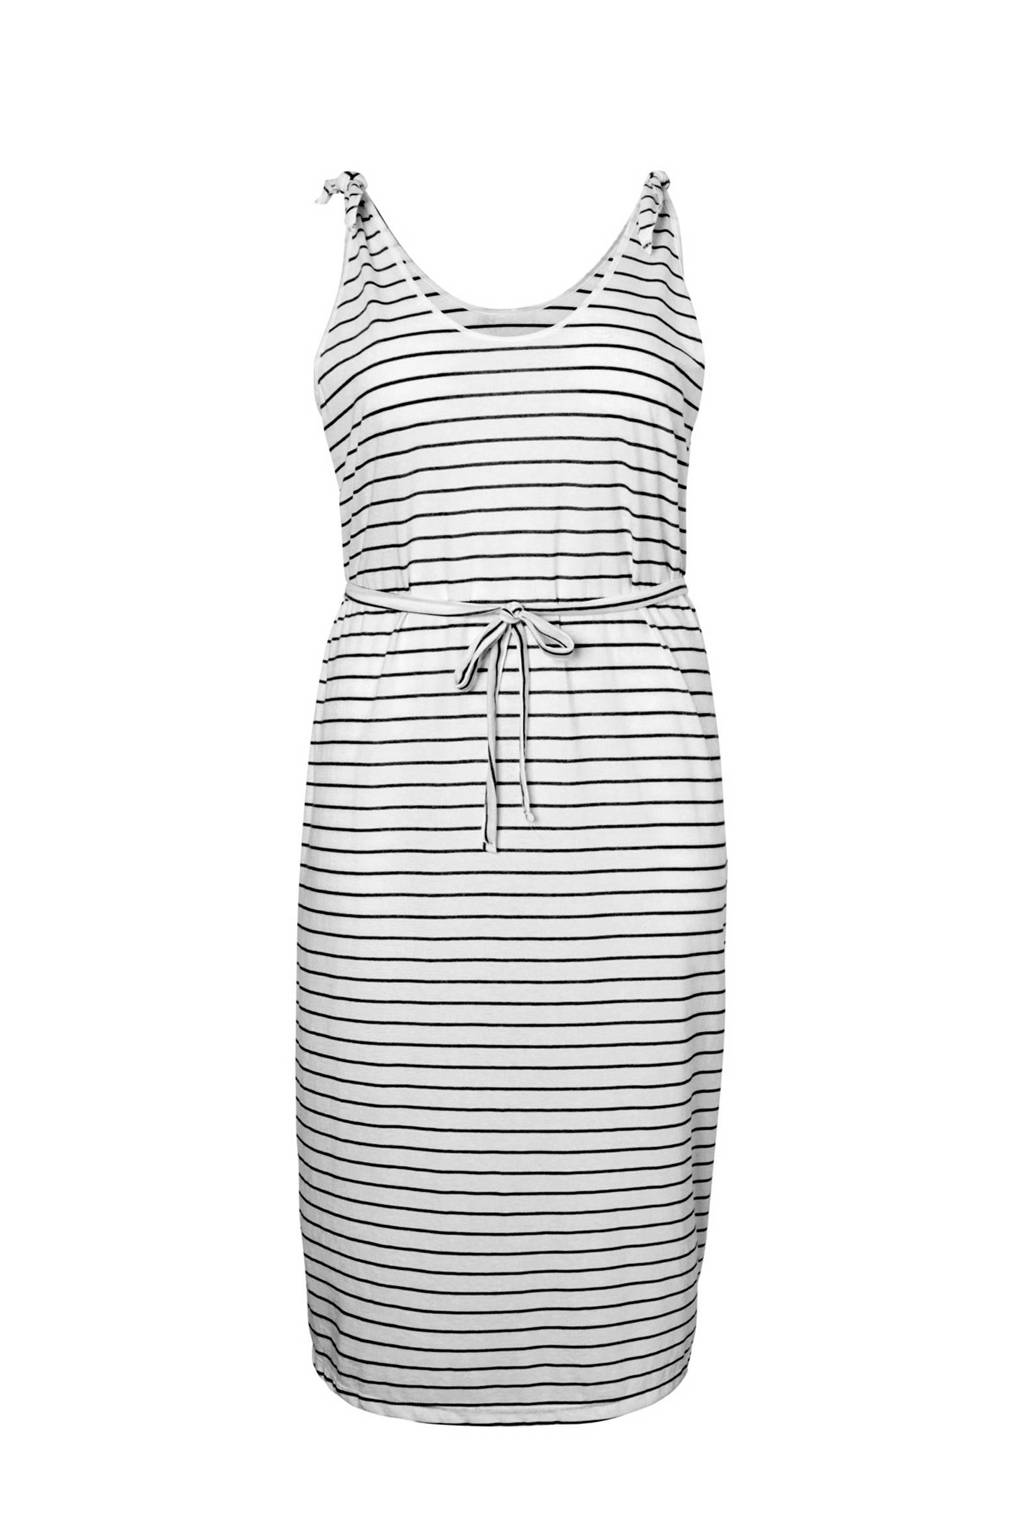 JUNAROSE gestreepte jurk, Wit/zwart